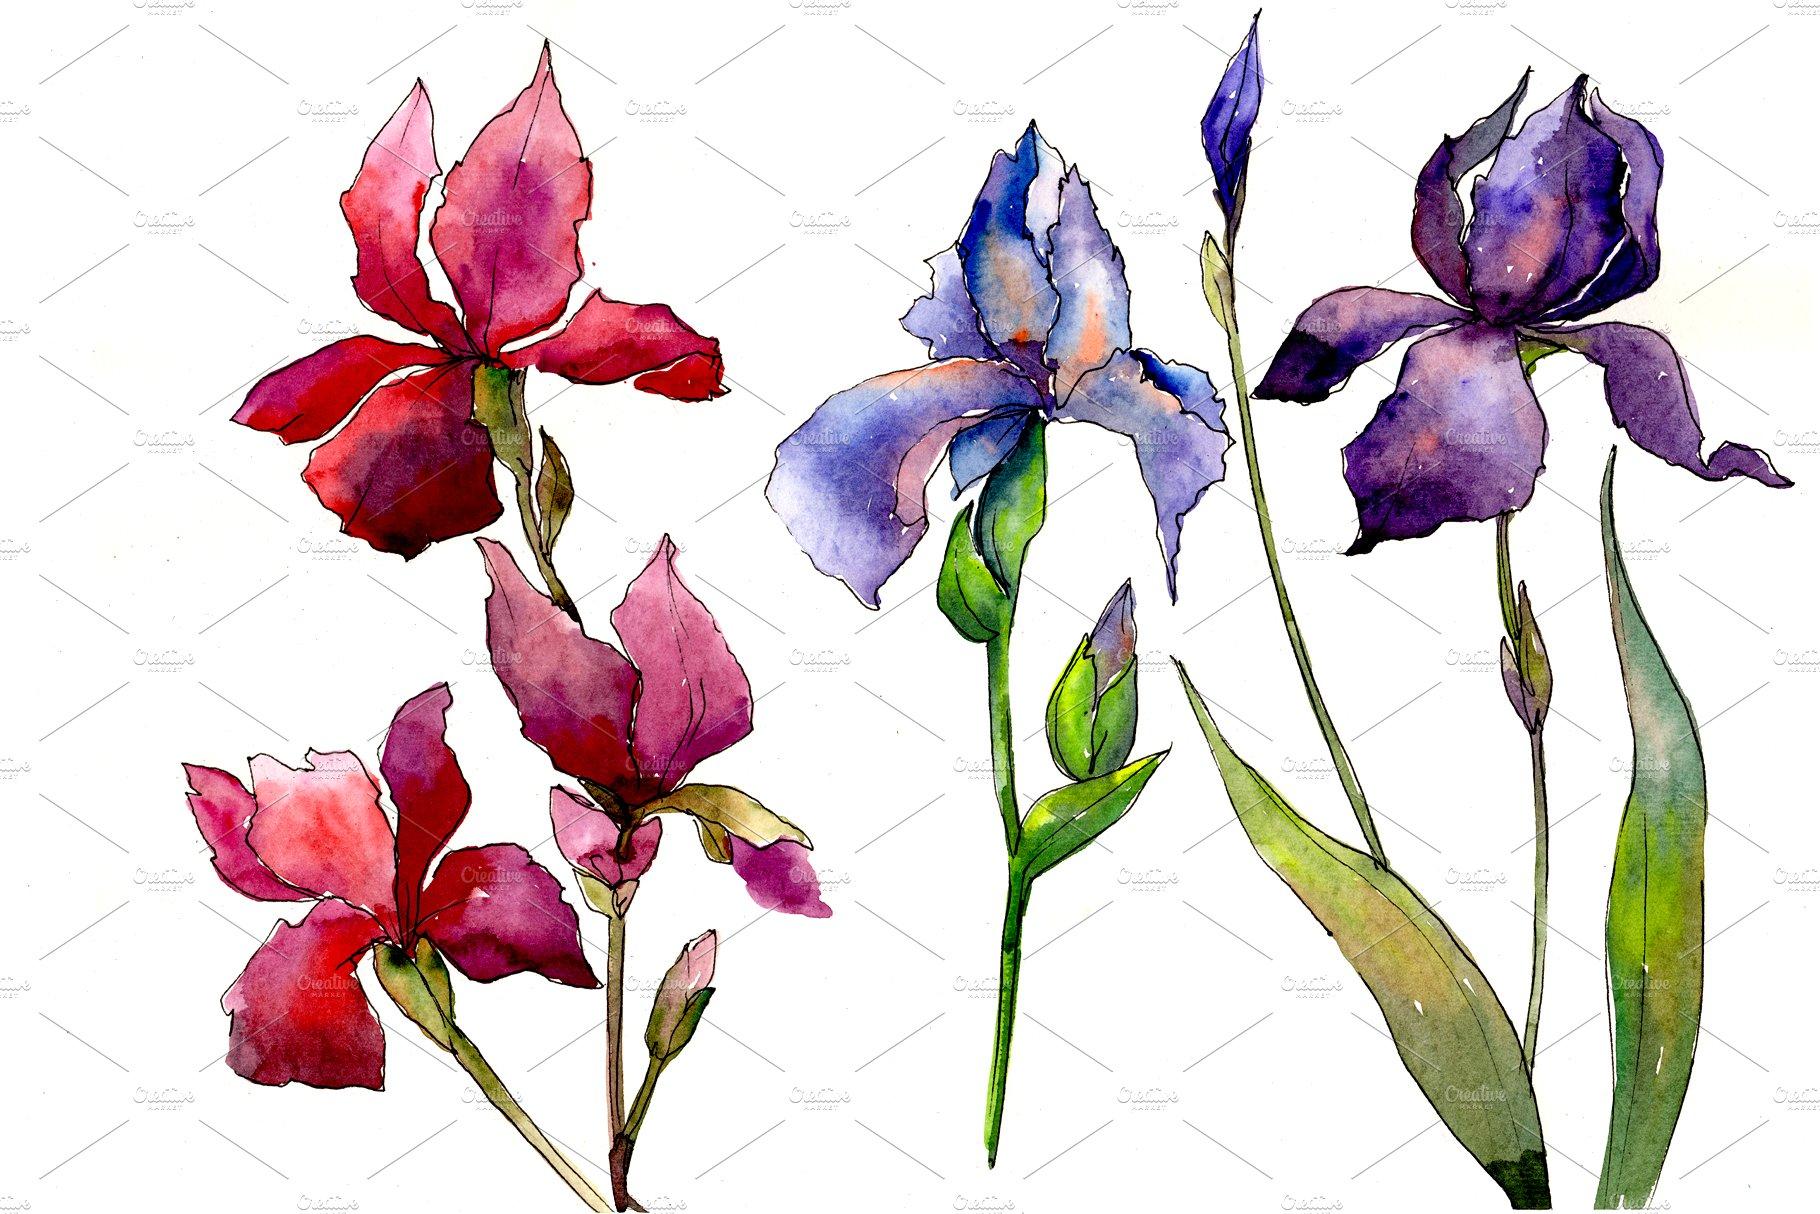 Red and purple irises flowers png illustrations creative market izmirmasajfo